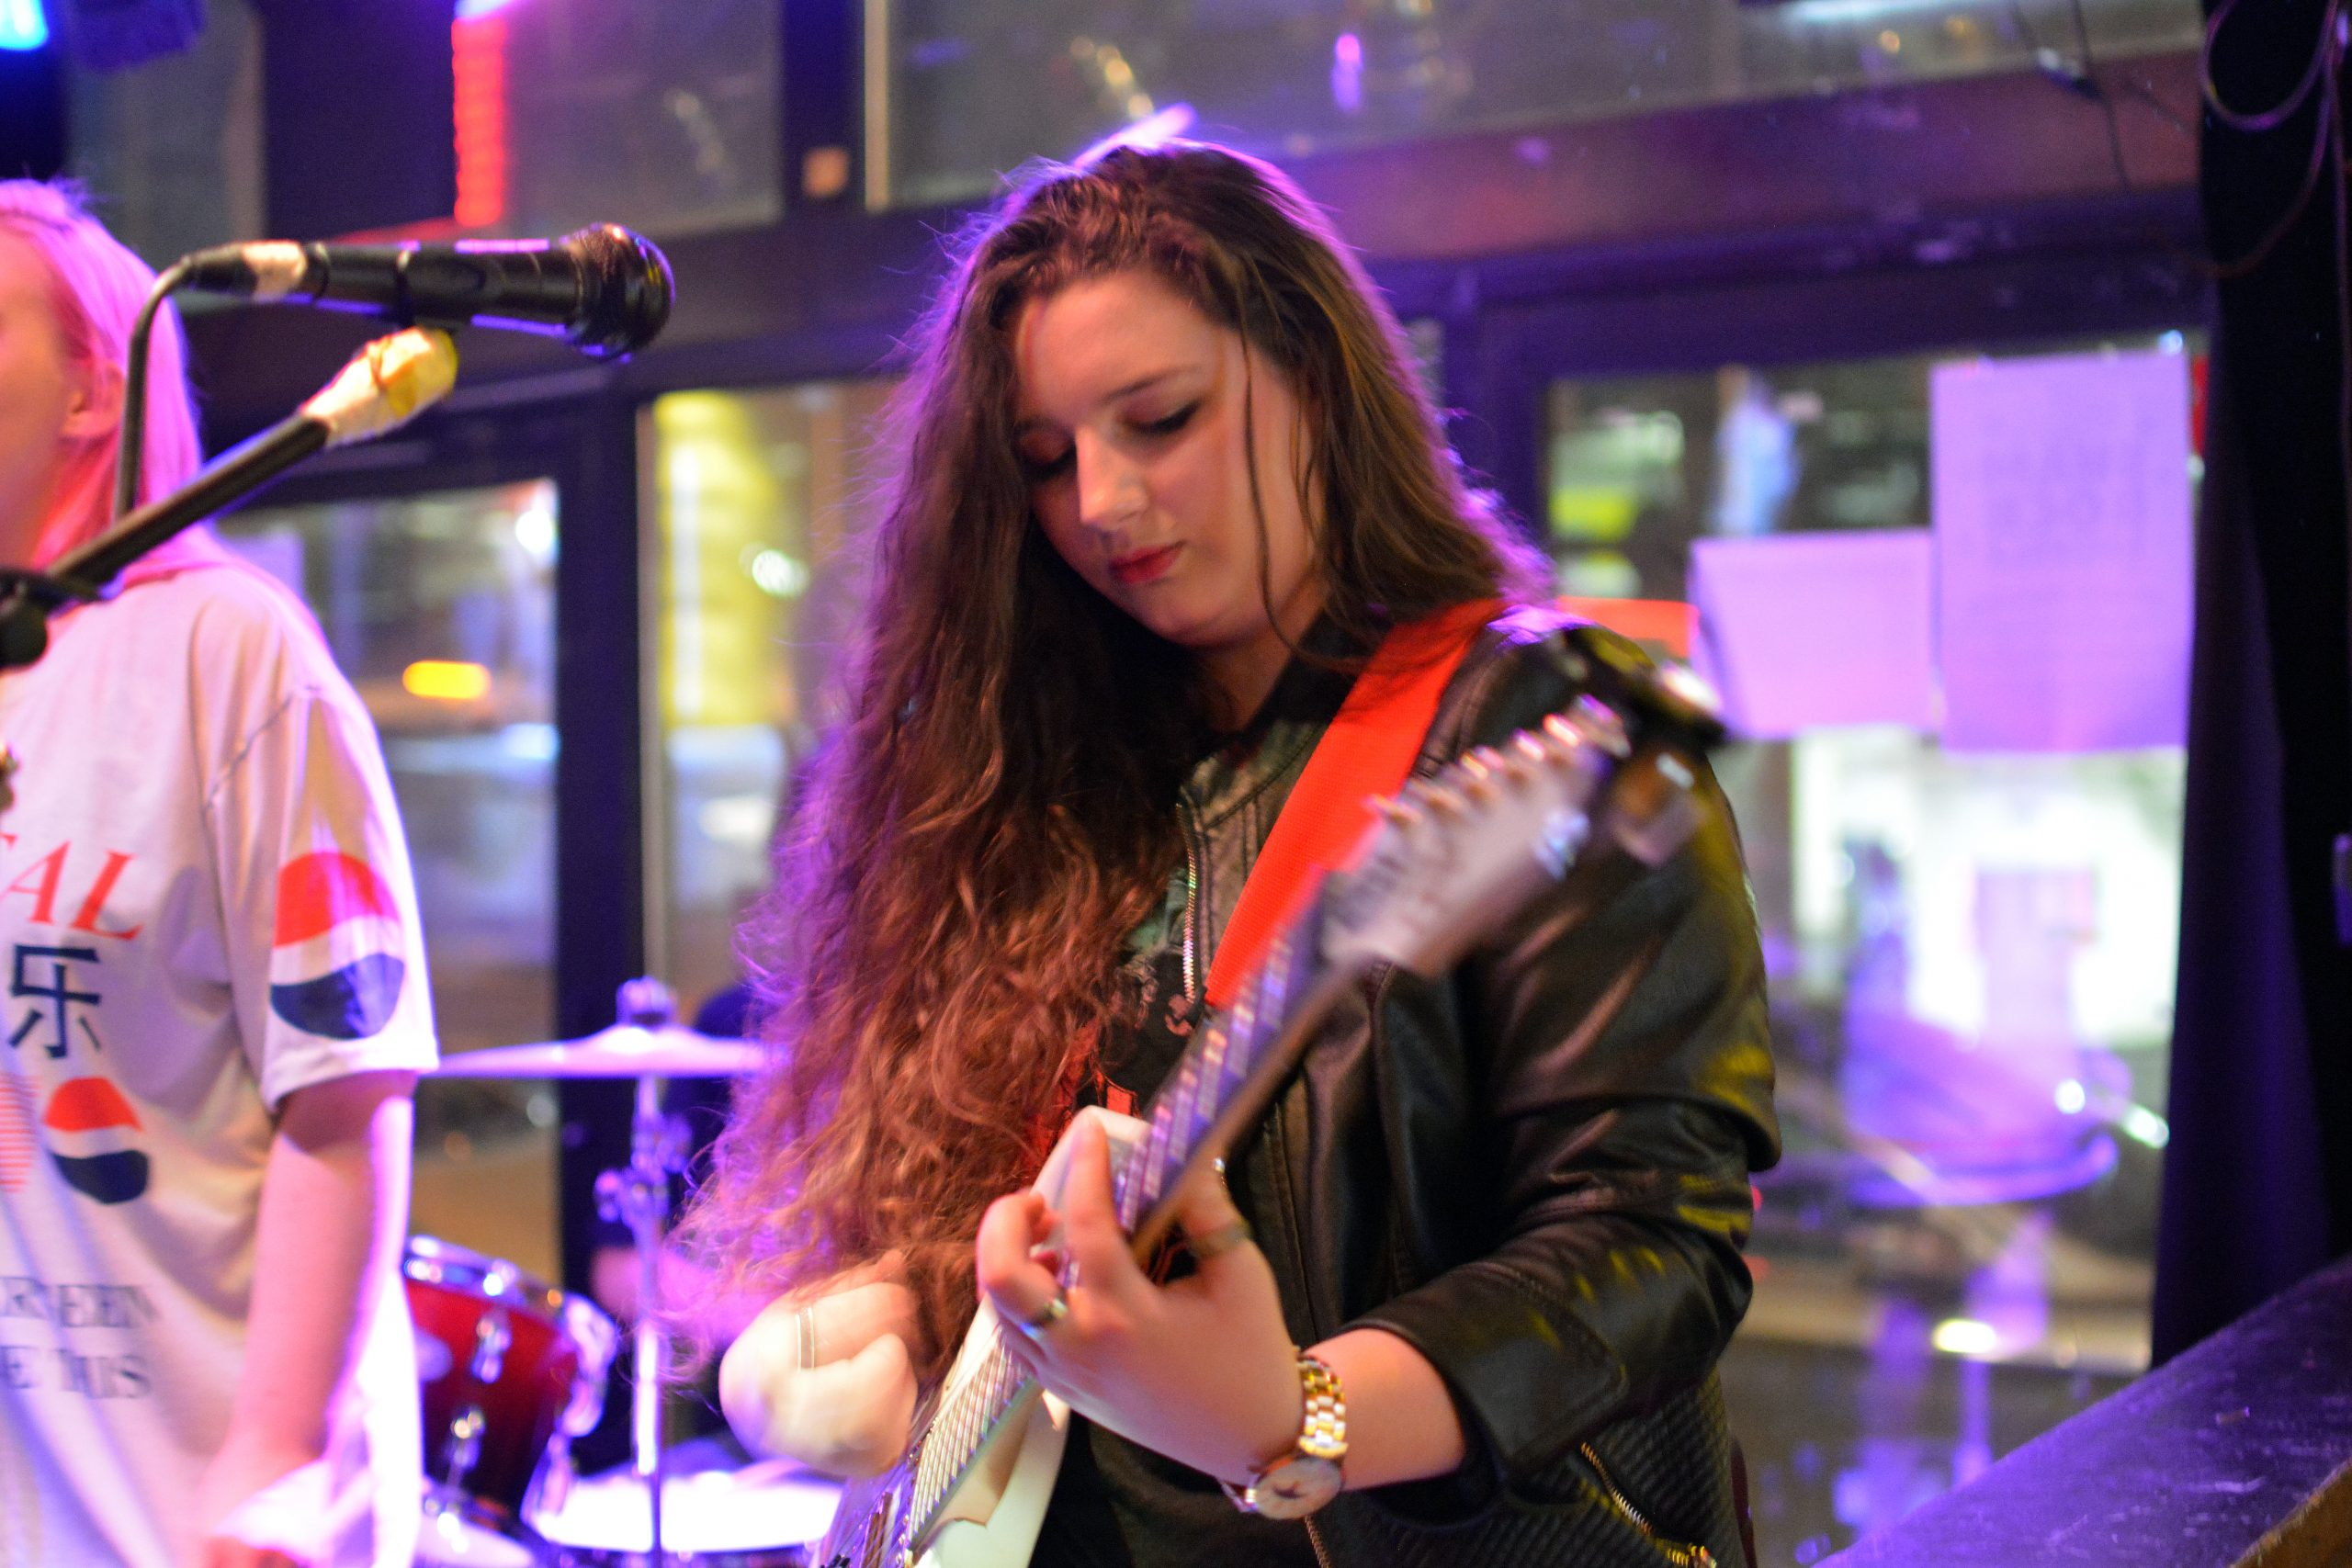 Elly Bird plays electric guitar